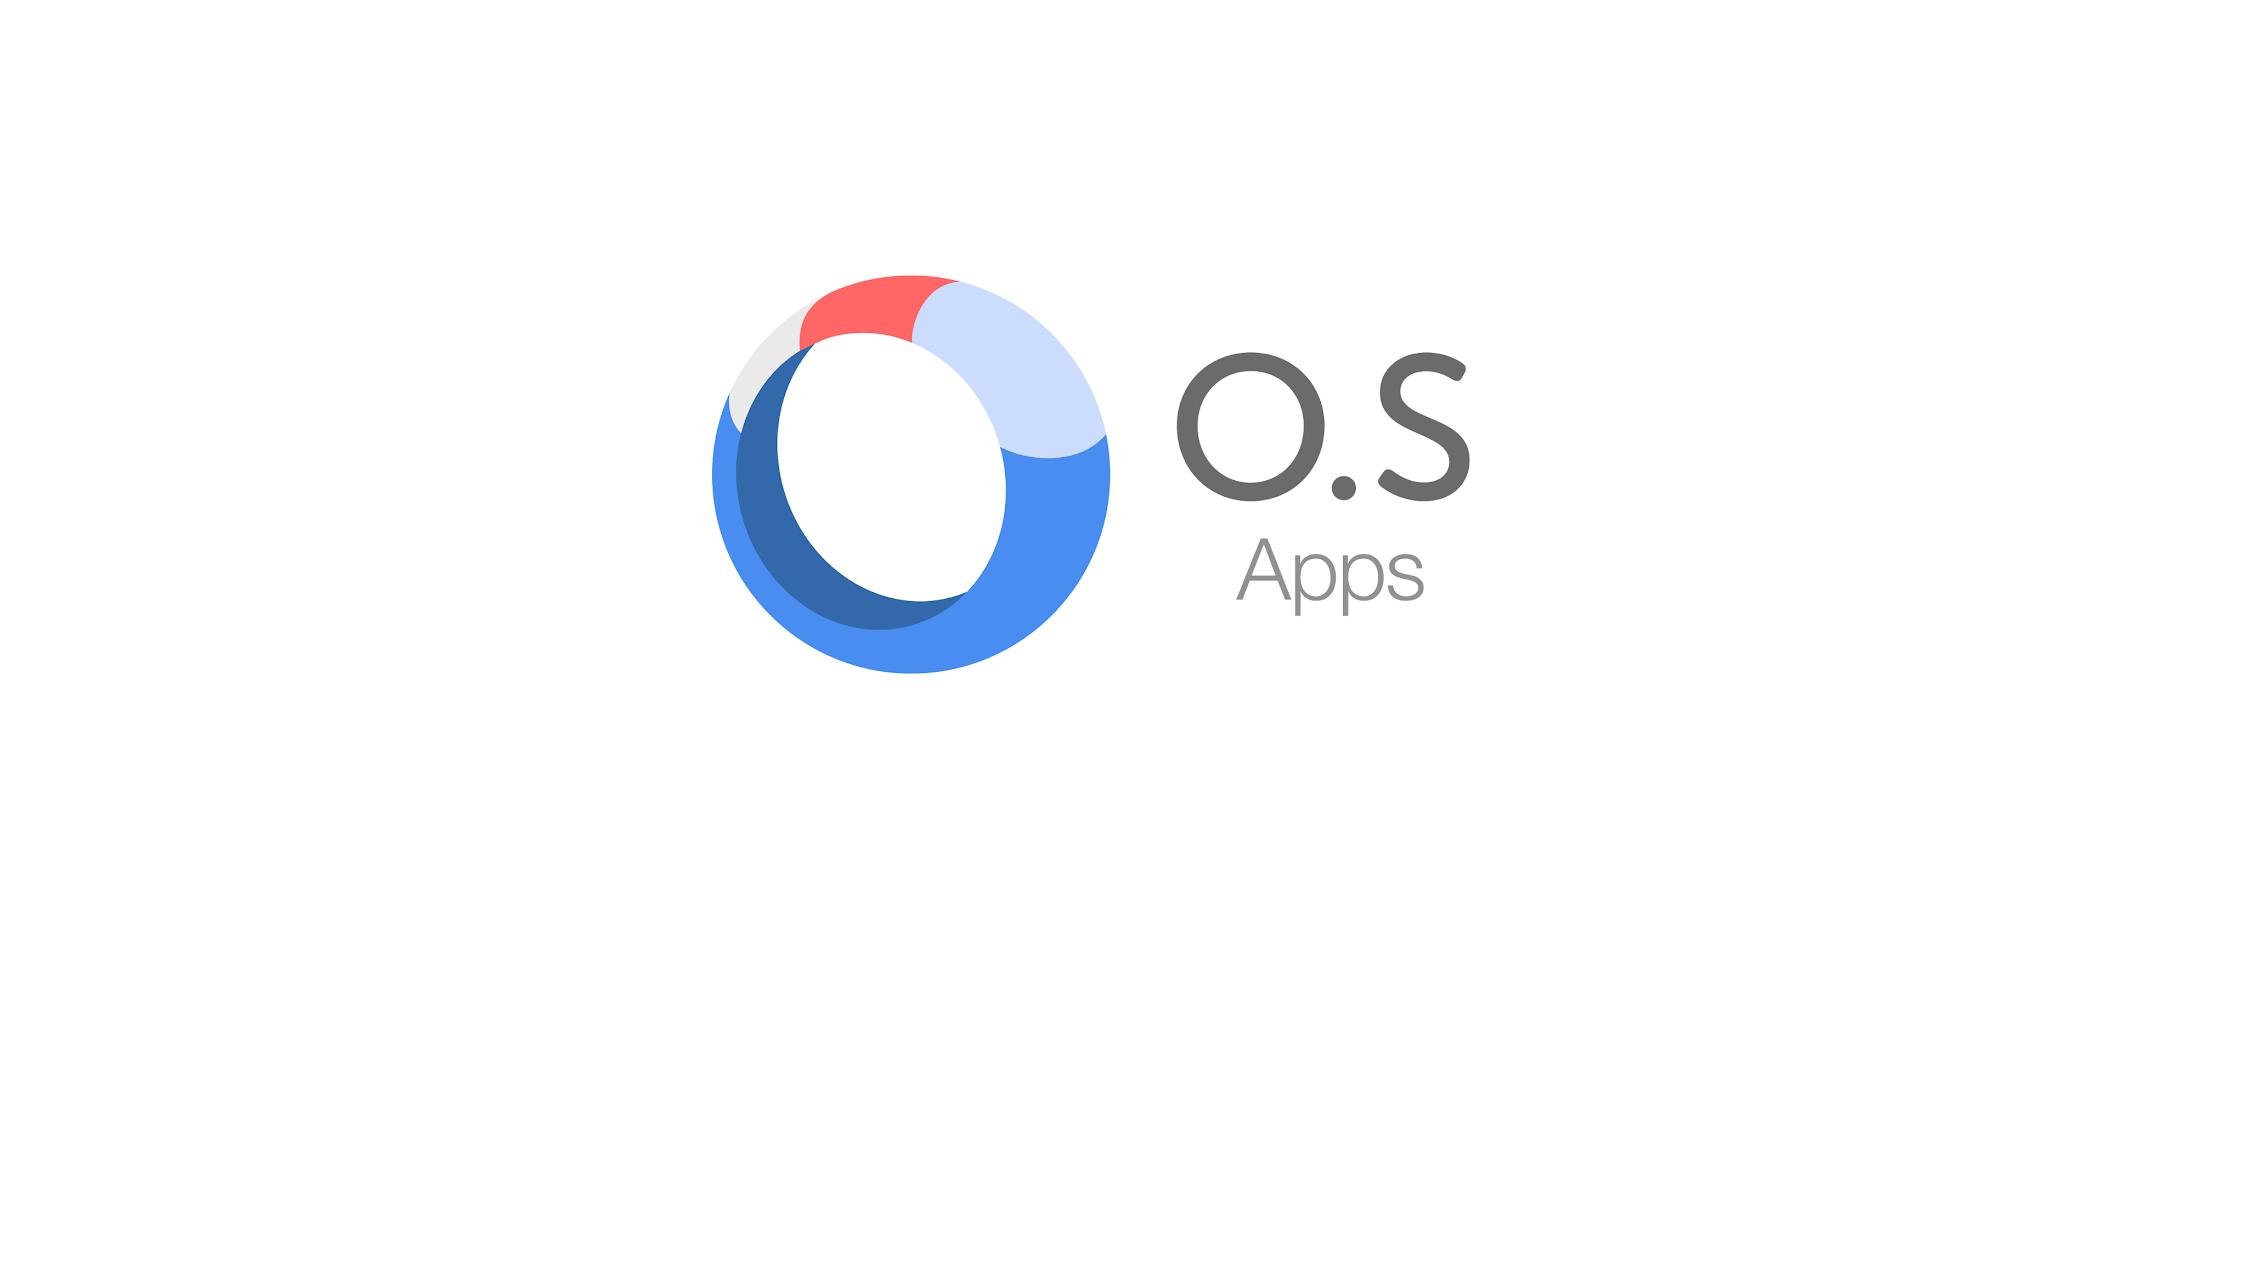 osApps